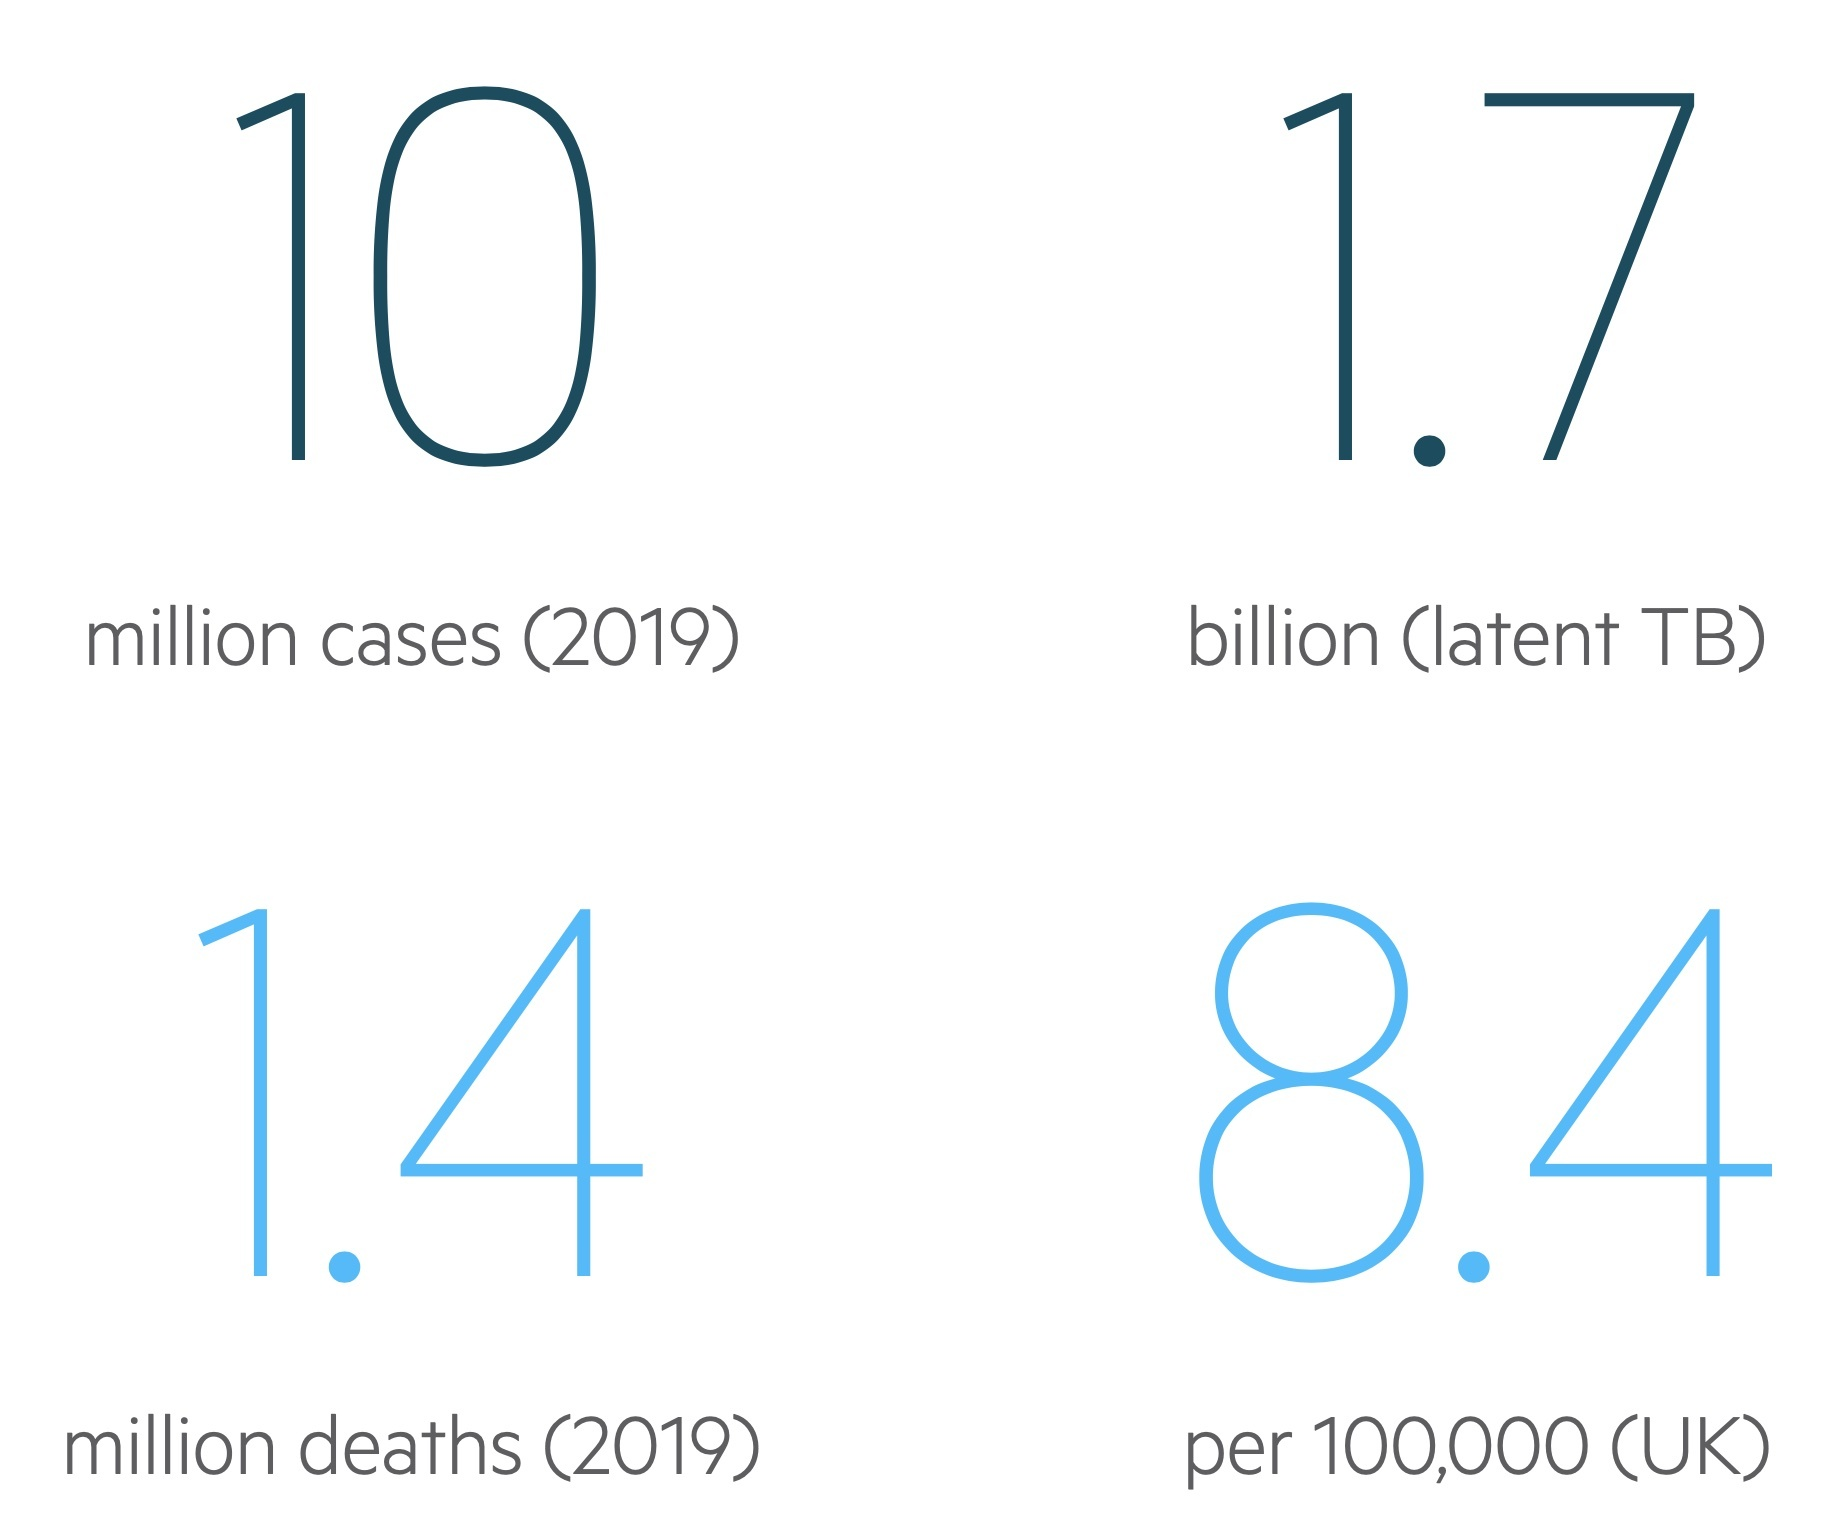 Tuberculosis (TB) statistics